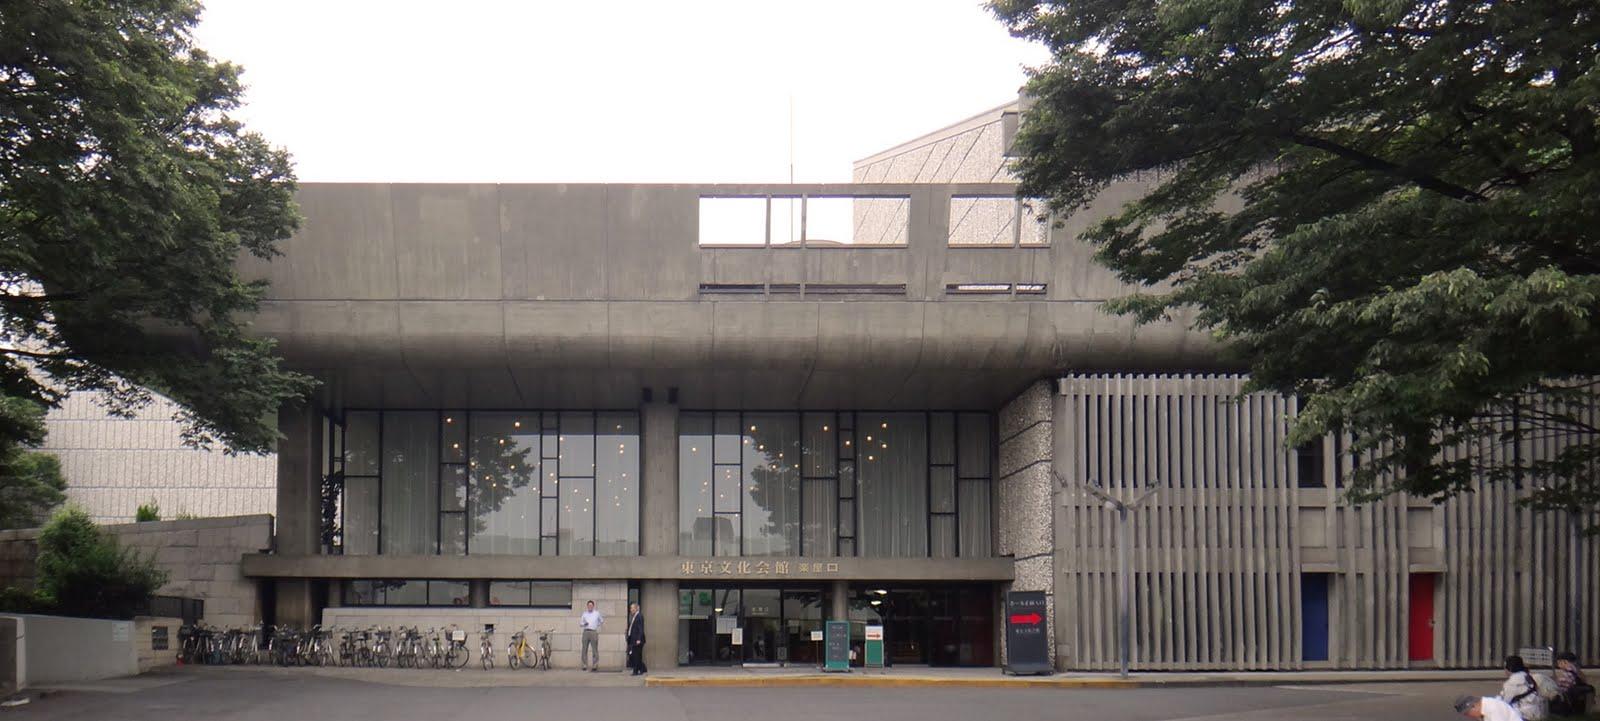 Architecture by kunio mayekawa modern design by for Architecture tokyo